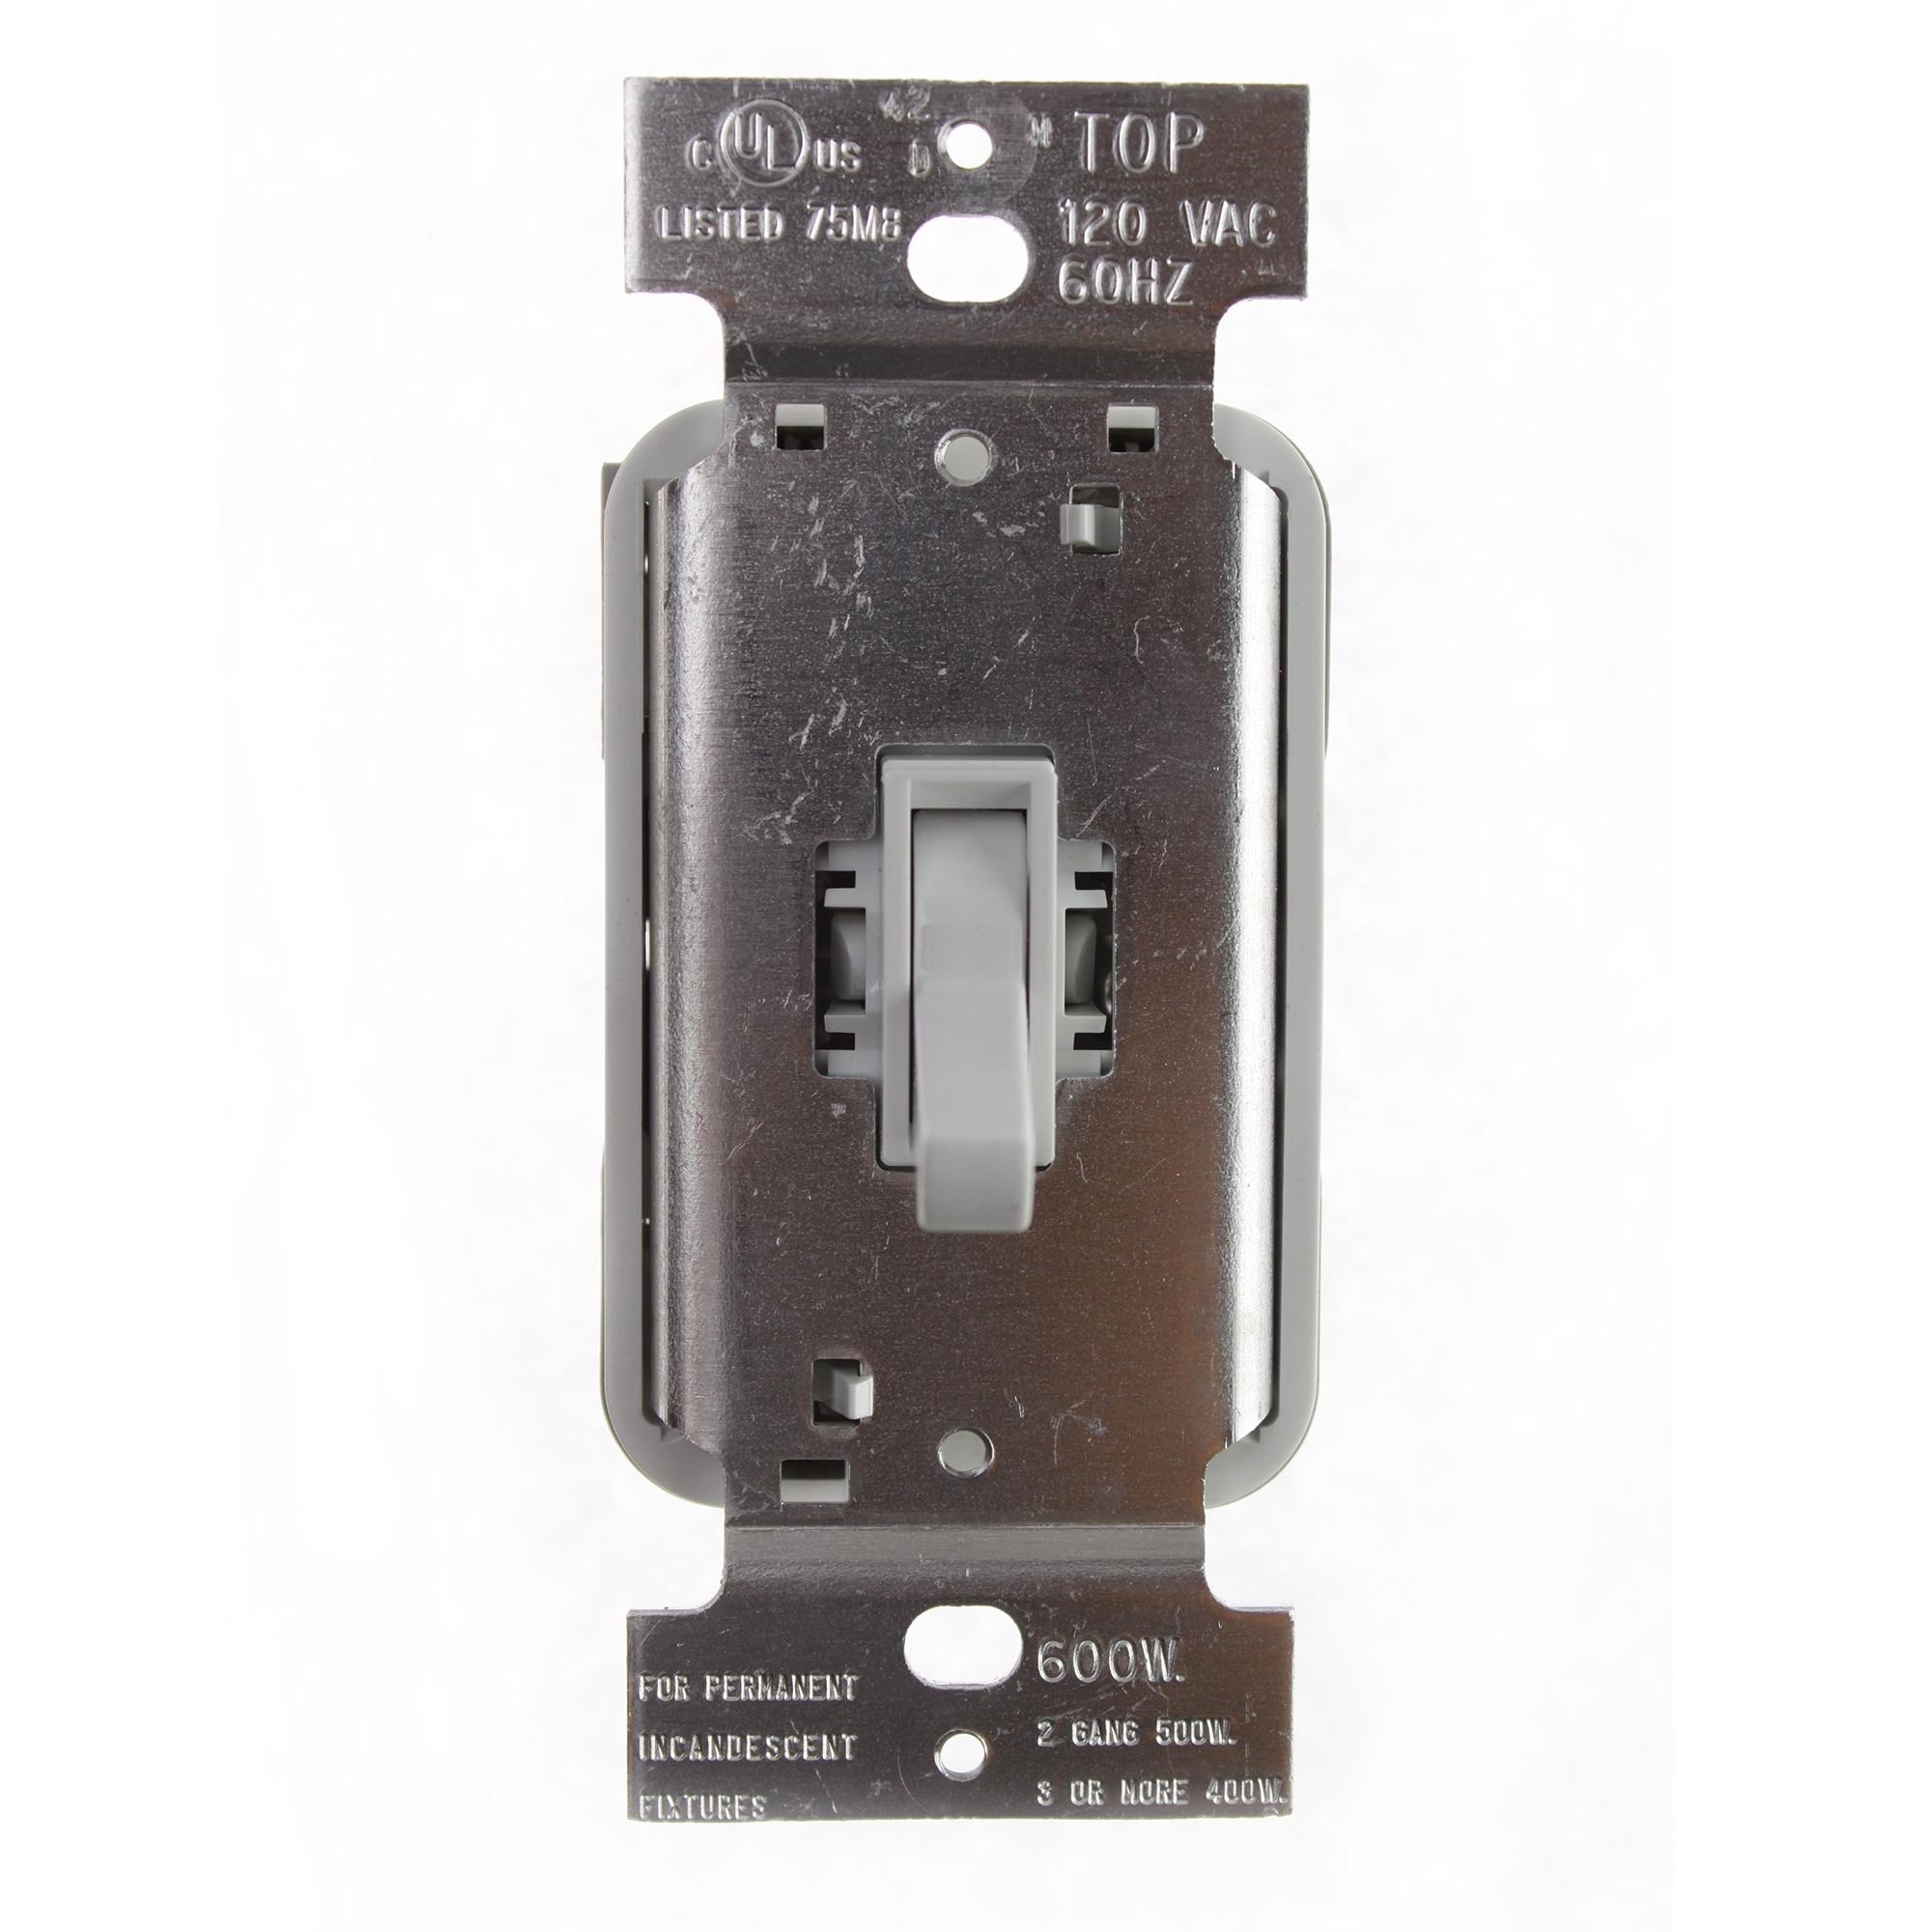 leviton decora 3 way switch wiring diagram fujitsu ten isuzu light switches pass seymour legrand t600 w toggle dimmer 600w 120v white